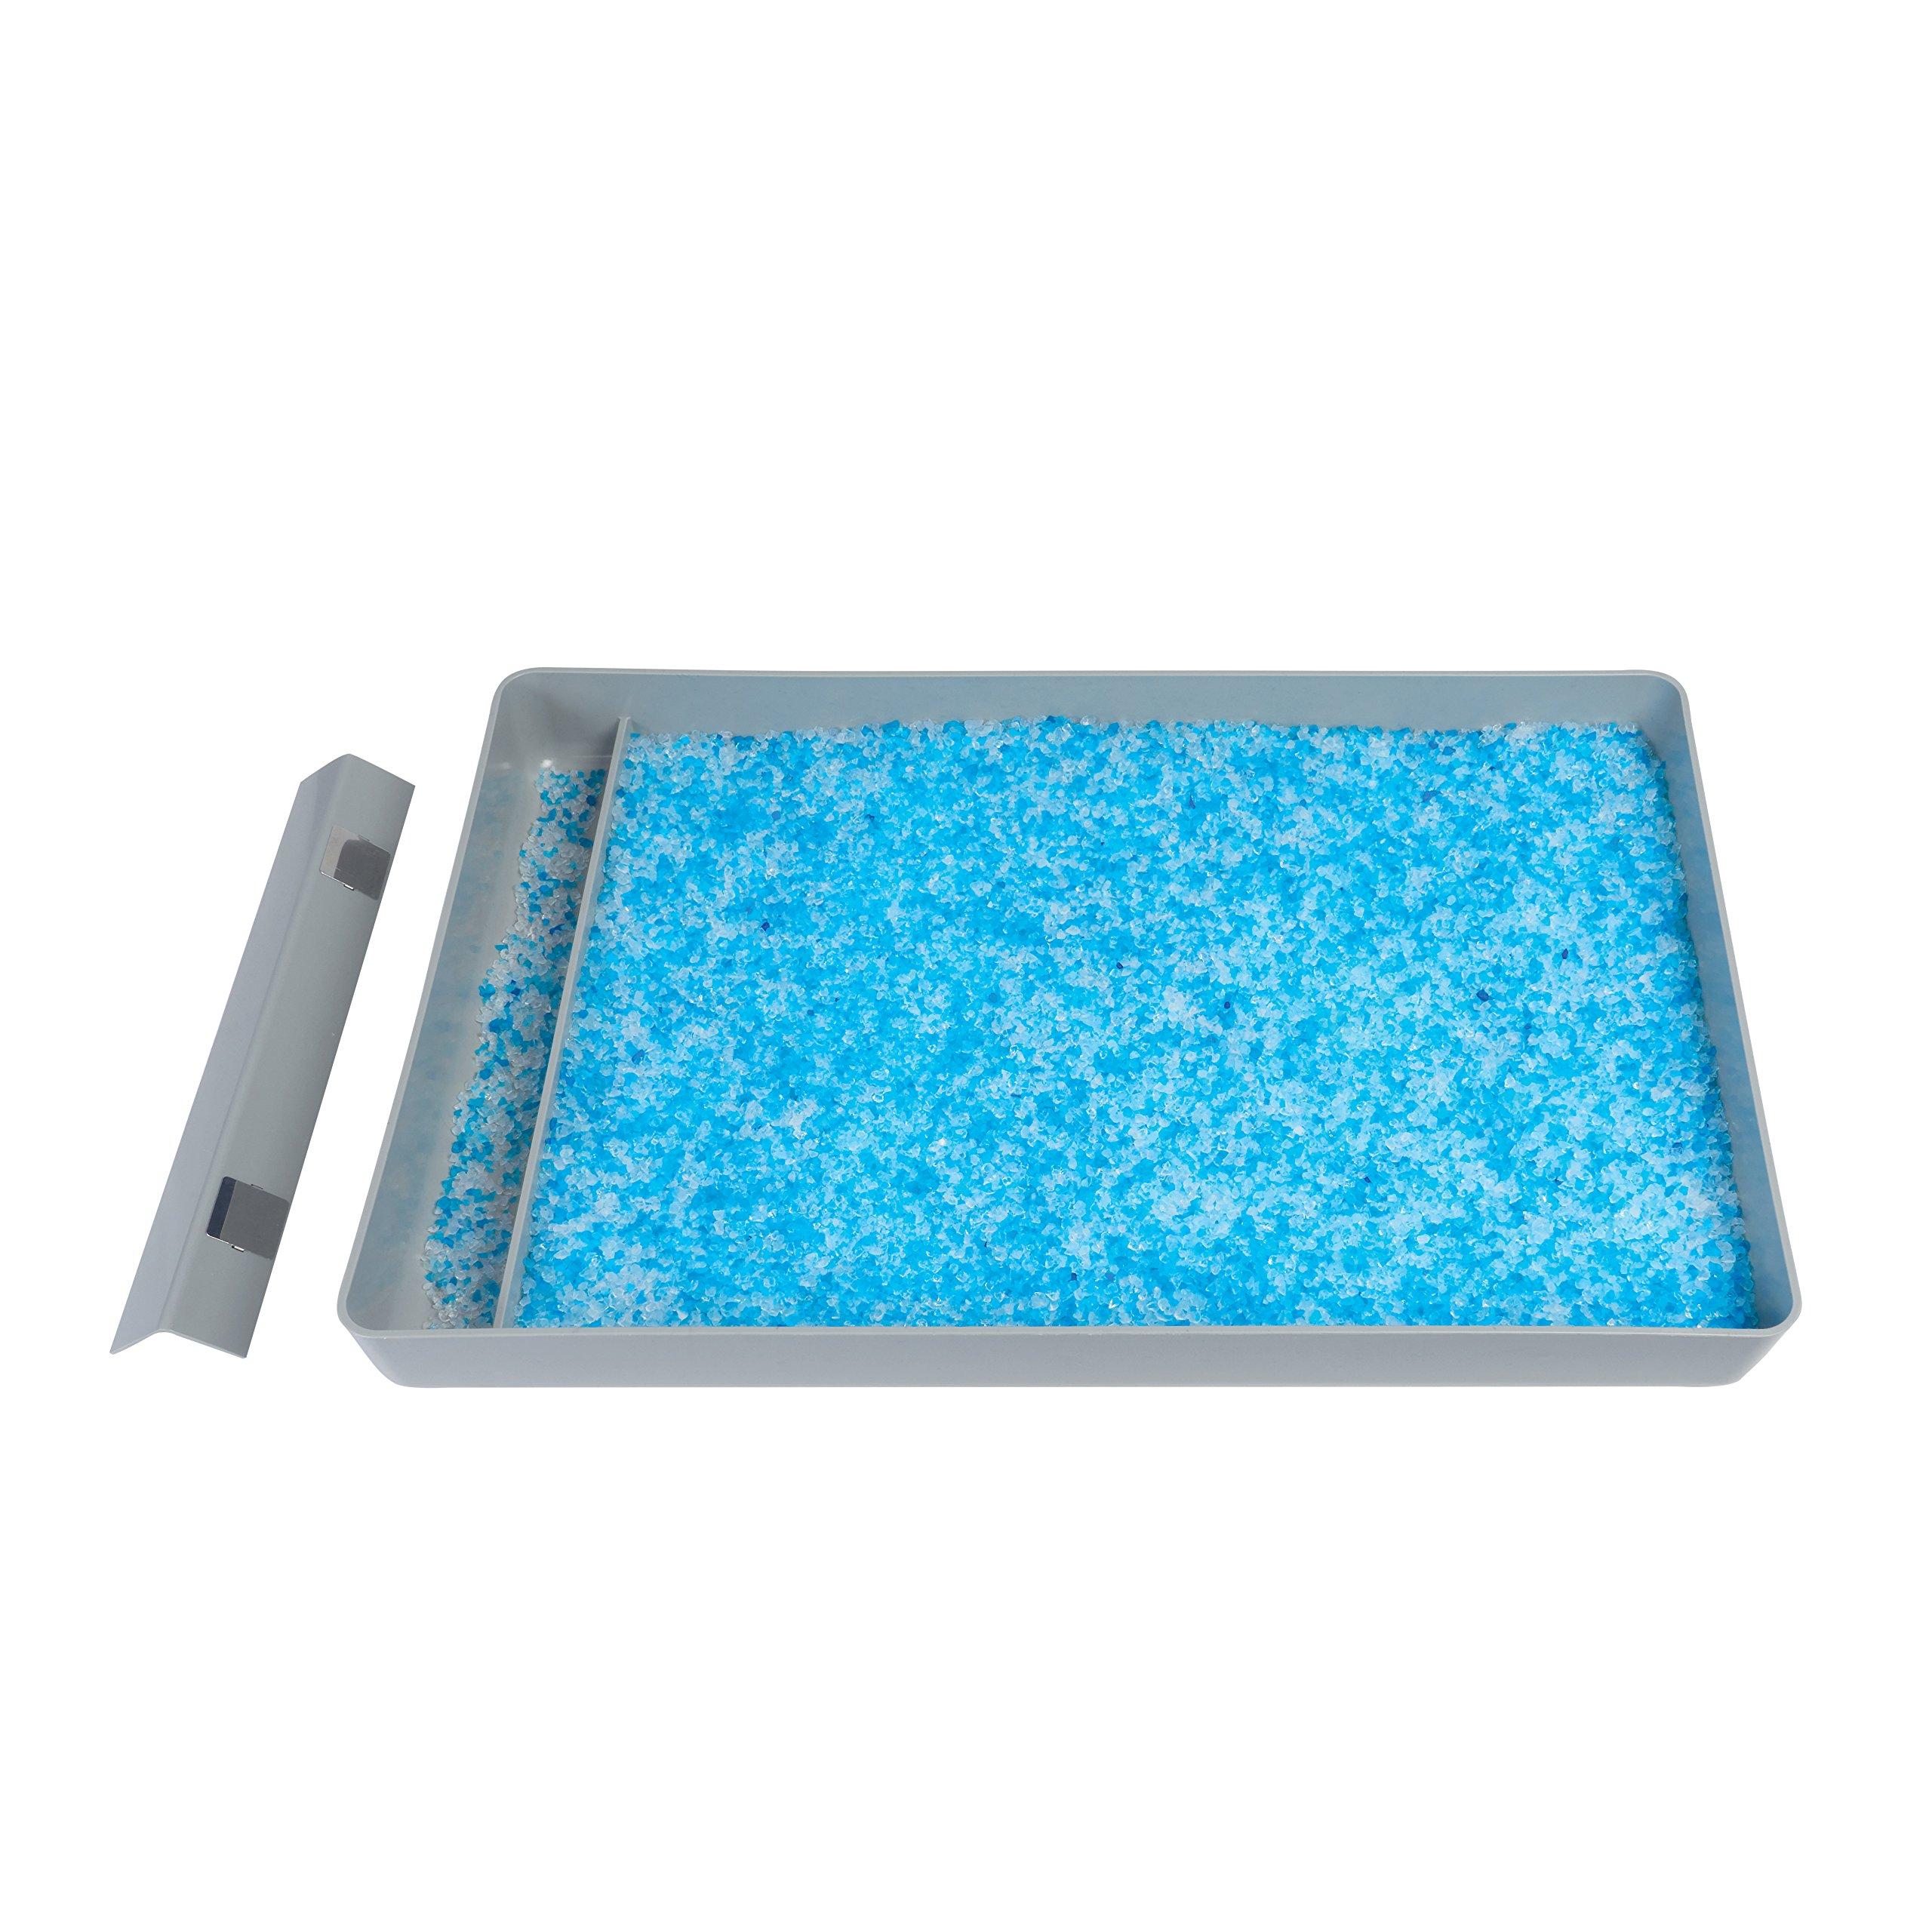 PetSafe ScoopFree Premium Blue Non Clumping Crystal Cat Litter, 2-Pack by PetSafe (Image #3)